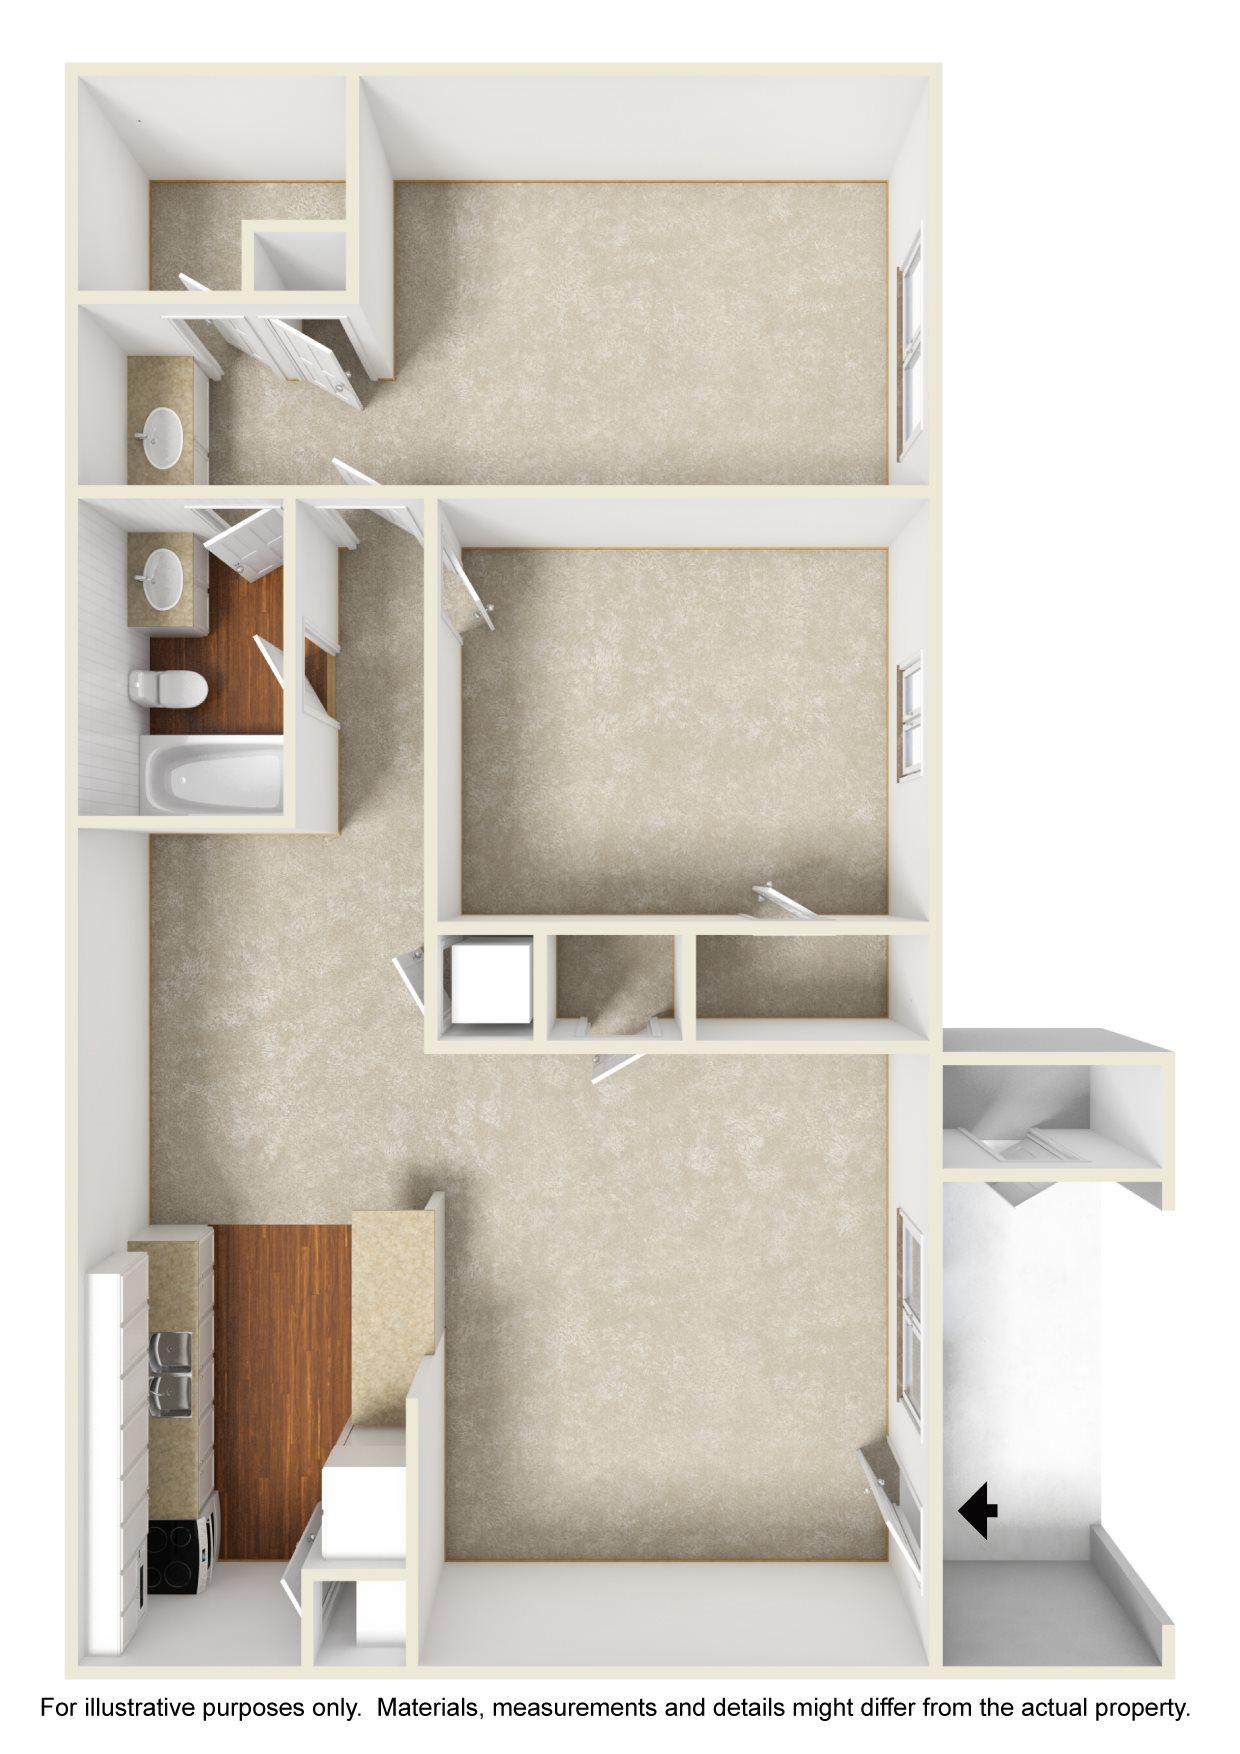 The Cordova Floor Plan 2